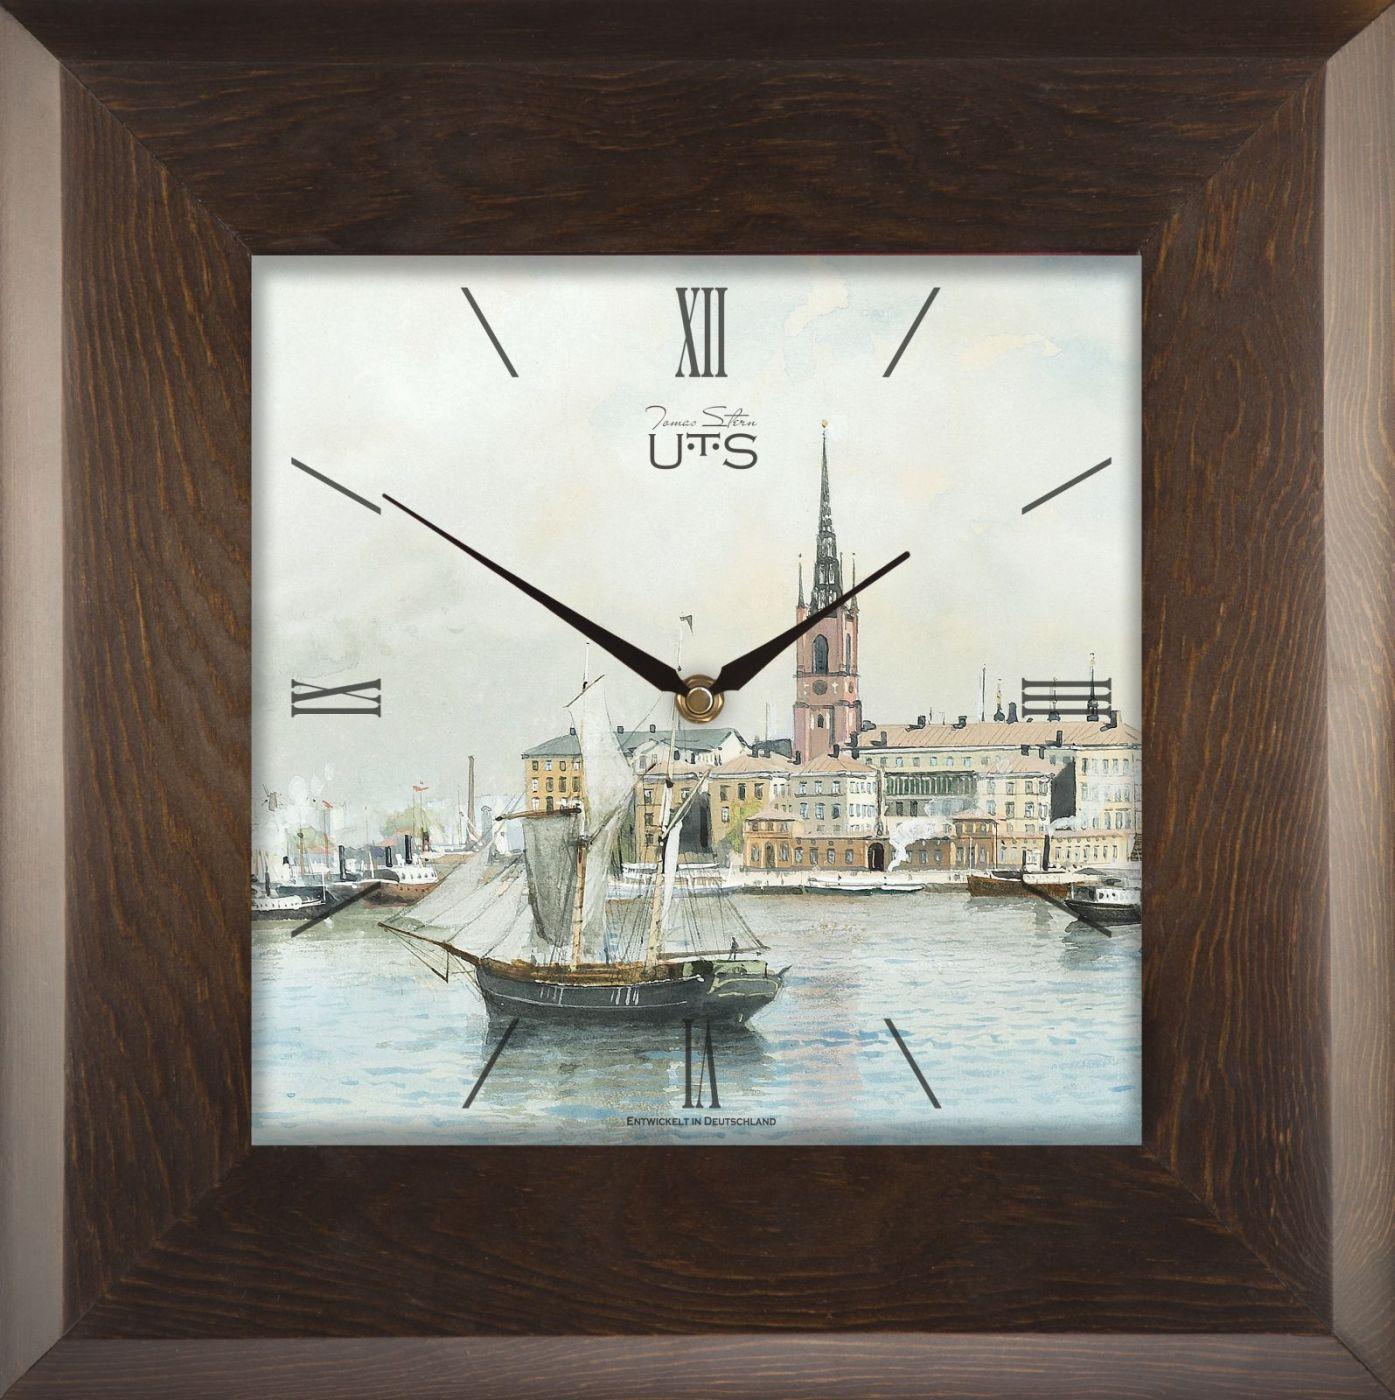 Часы настенные Часы настенные Tomas Stern 7010 chasy-nastennye-tomas-stern-7010-germaniya-tayvan.jpg